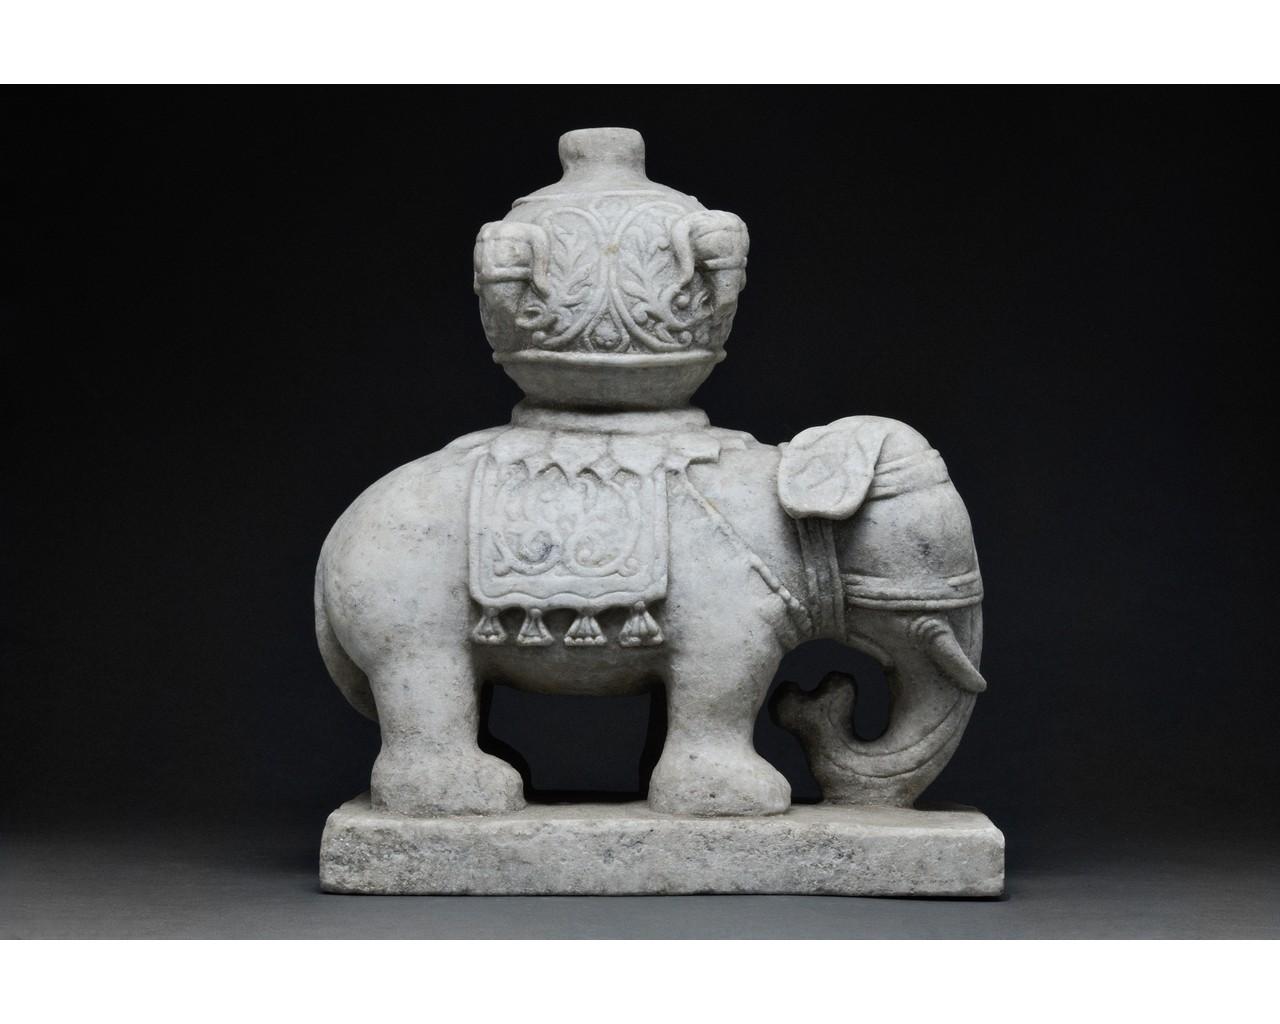 CHINESE MING DYNASTY MARBLE ELEPHANT - Image 2 of 6